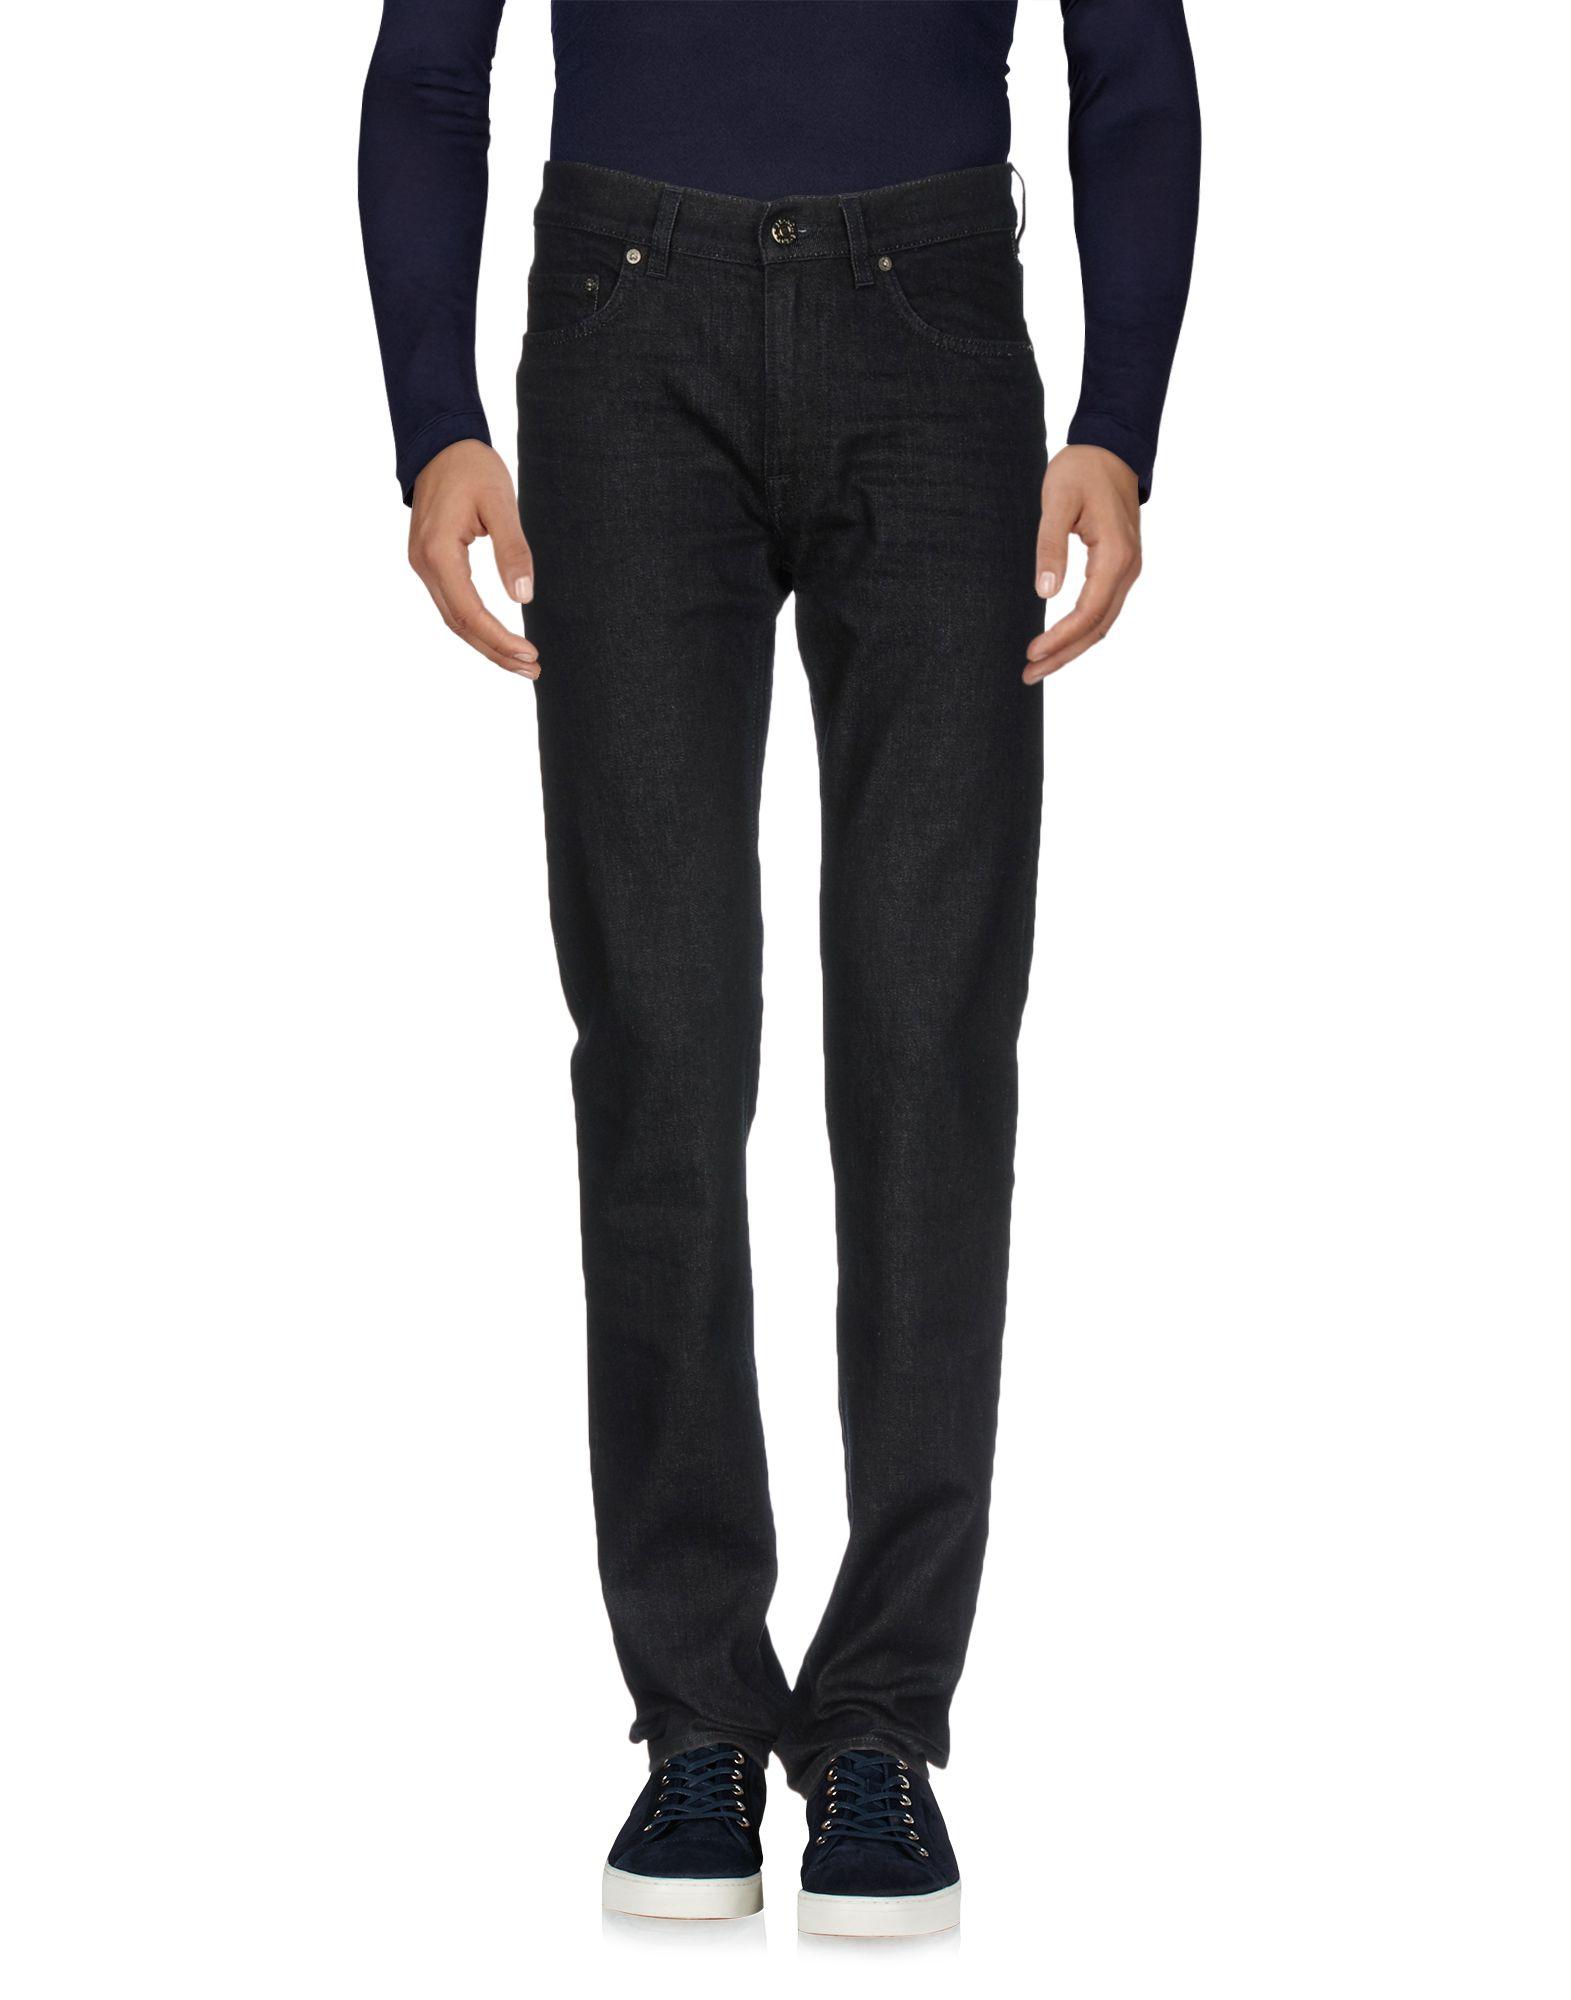 Pantaloni Jeans Acne Uomo Studios Uomo Acne - 42673140XR 2aac54